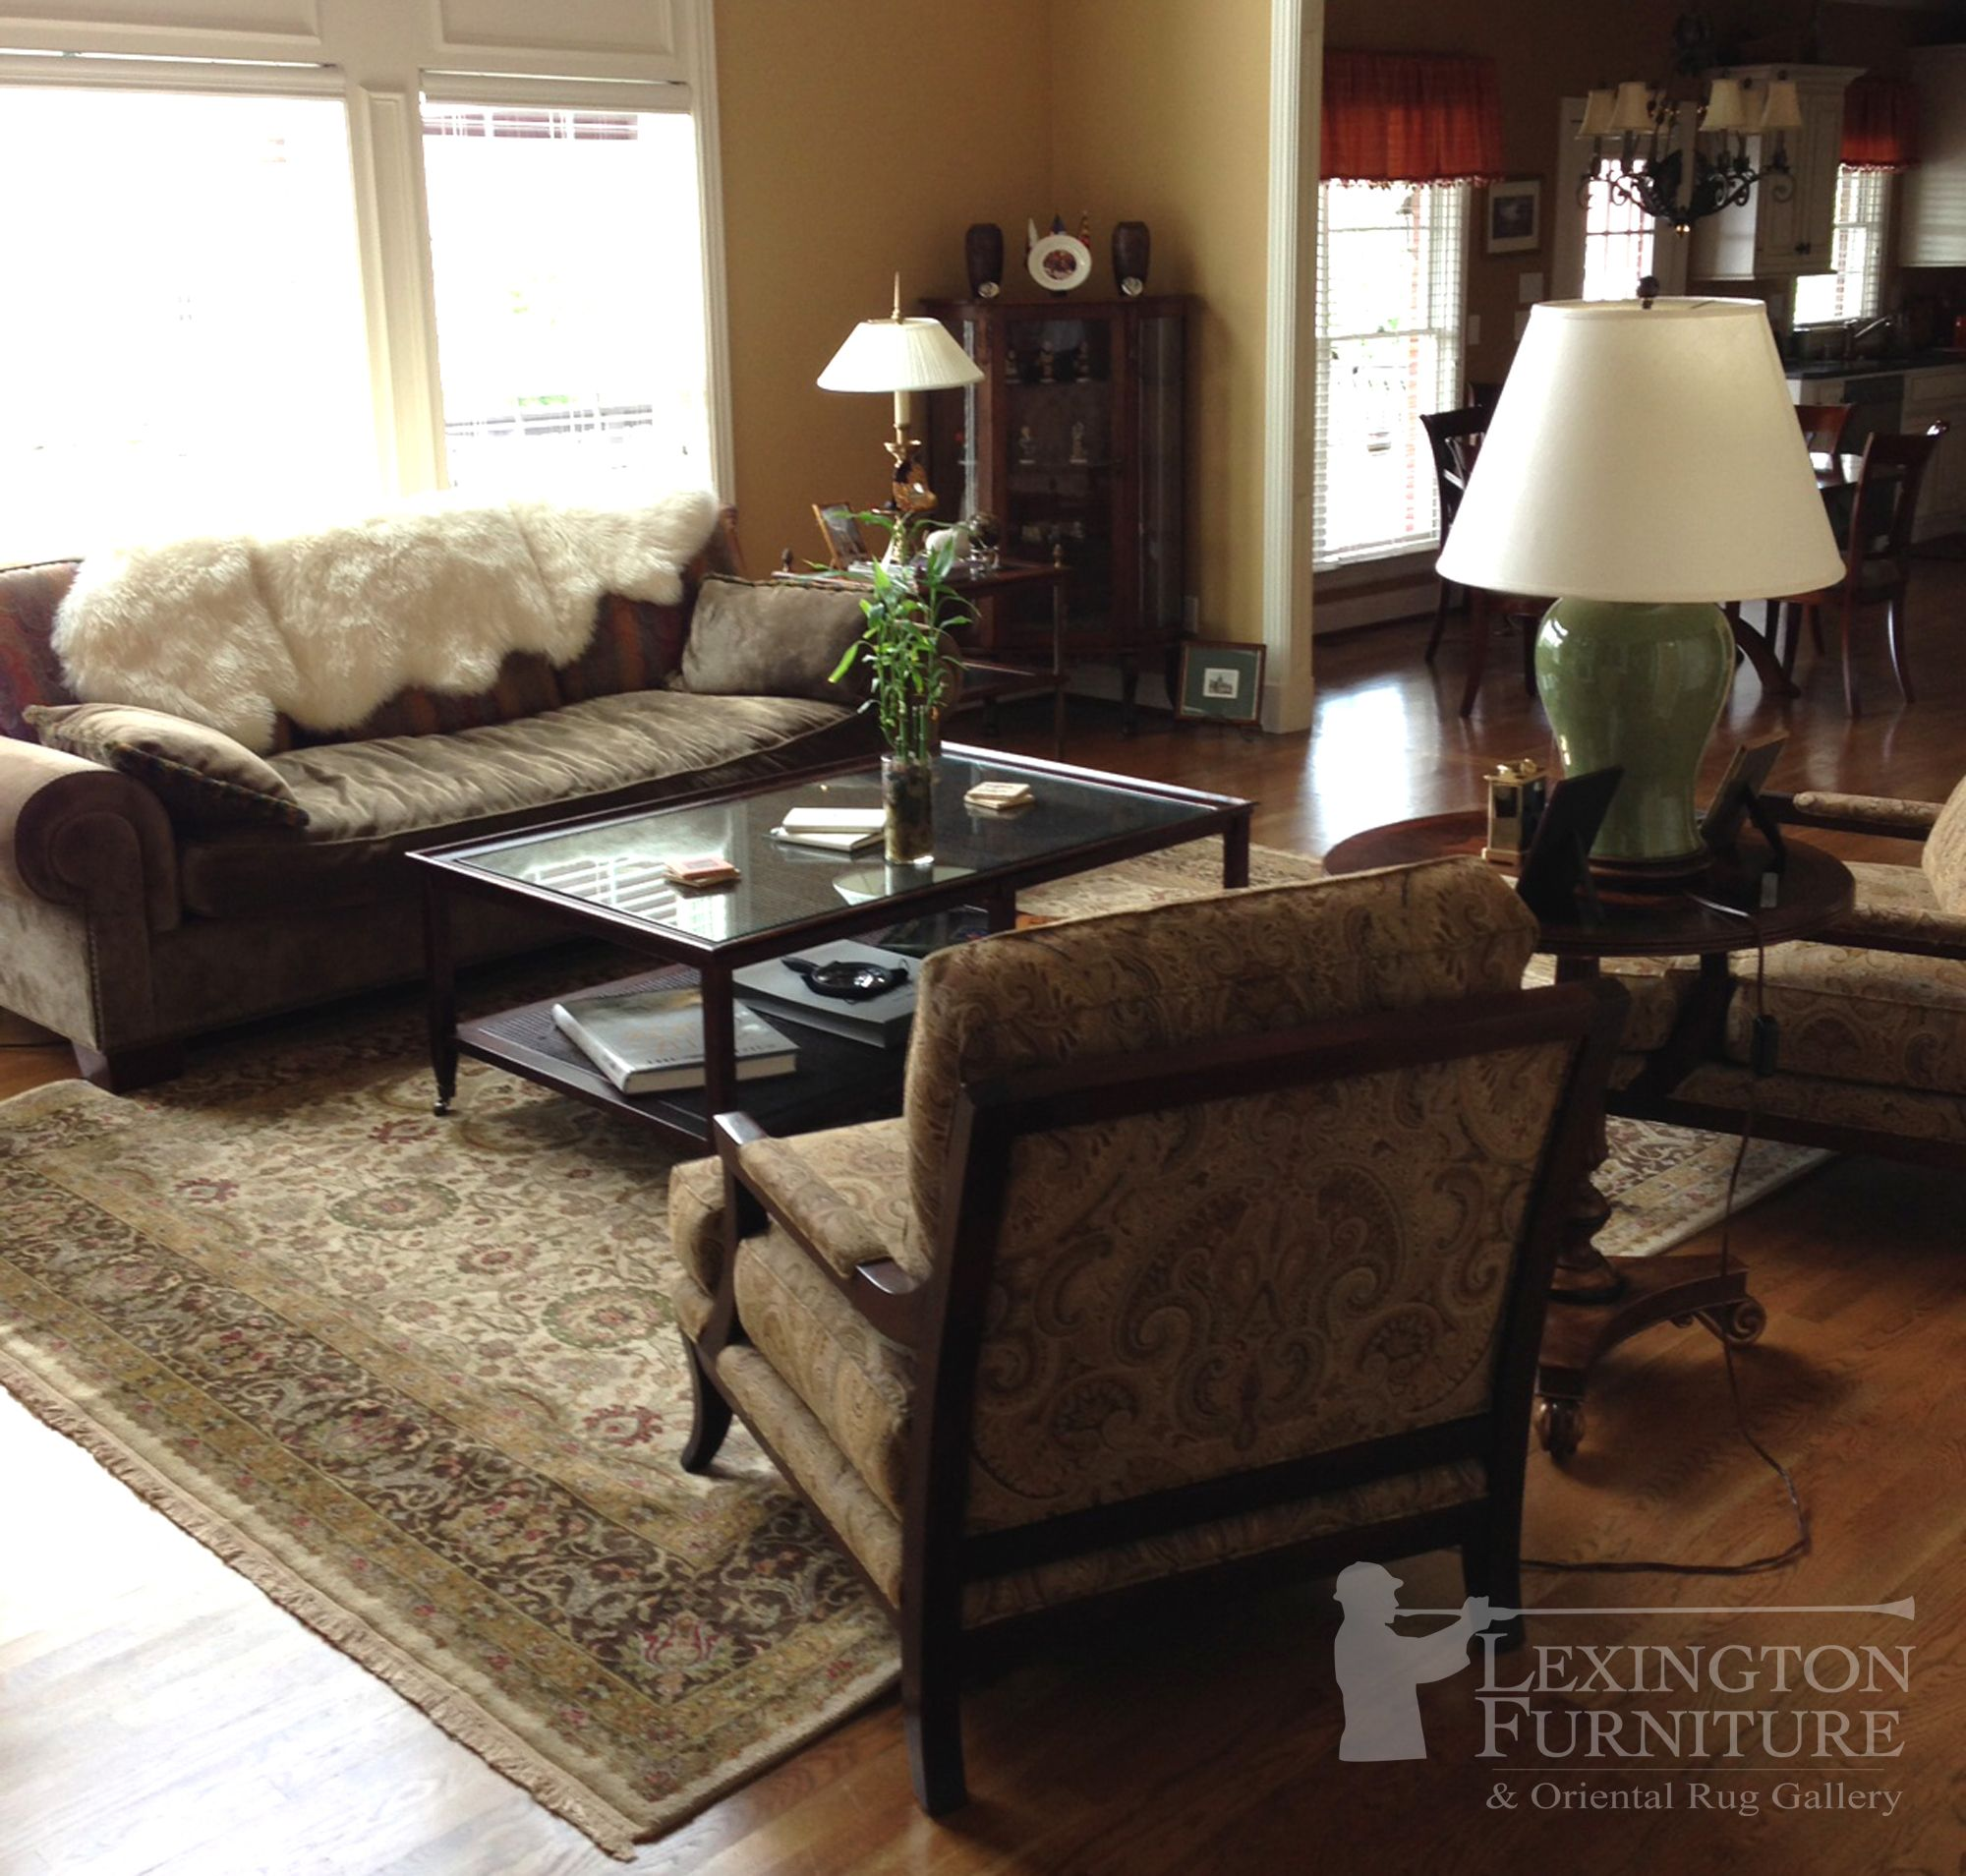 kalaty shah jahan oriental rug in living room setting earth tones